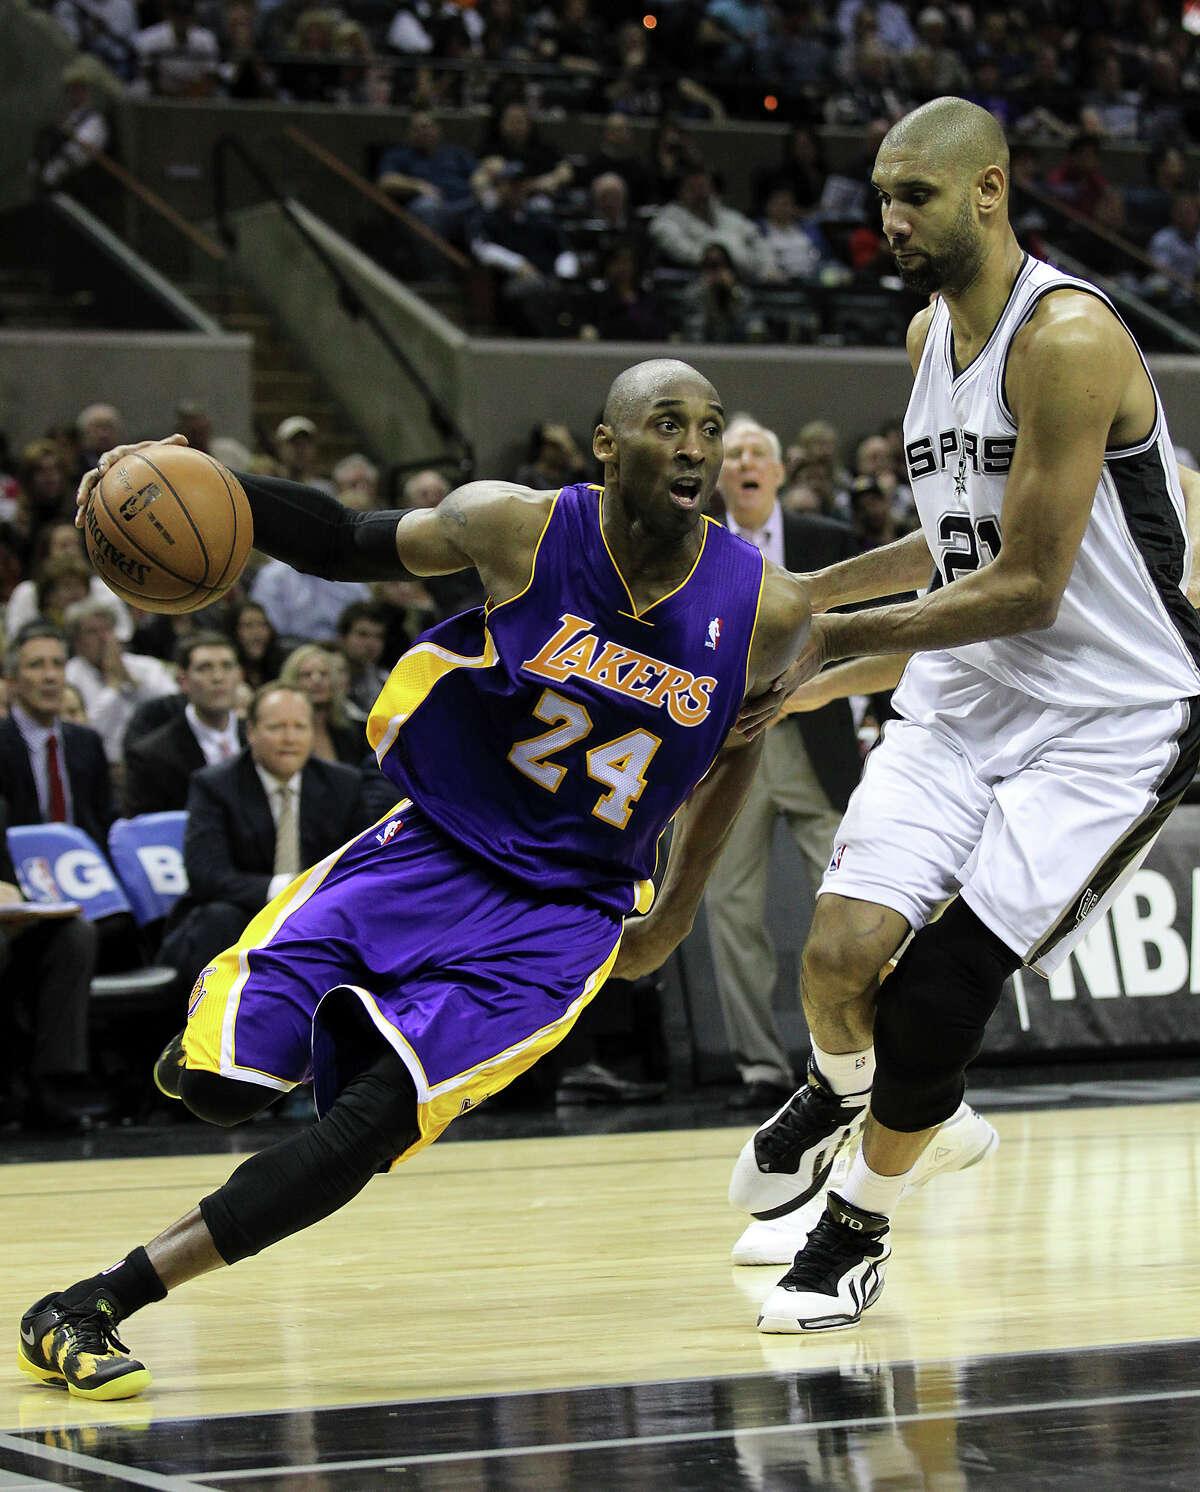 Kobe Bryant Draft: 1996, No. 13 Accolades: 5-time NBA champion, 2-time NBA Finals MVP, 2008 MVP, 17-time All-Star, 15-time All-NBA team, 12-time All-Defensive team